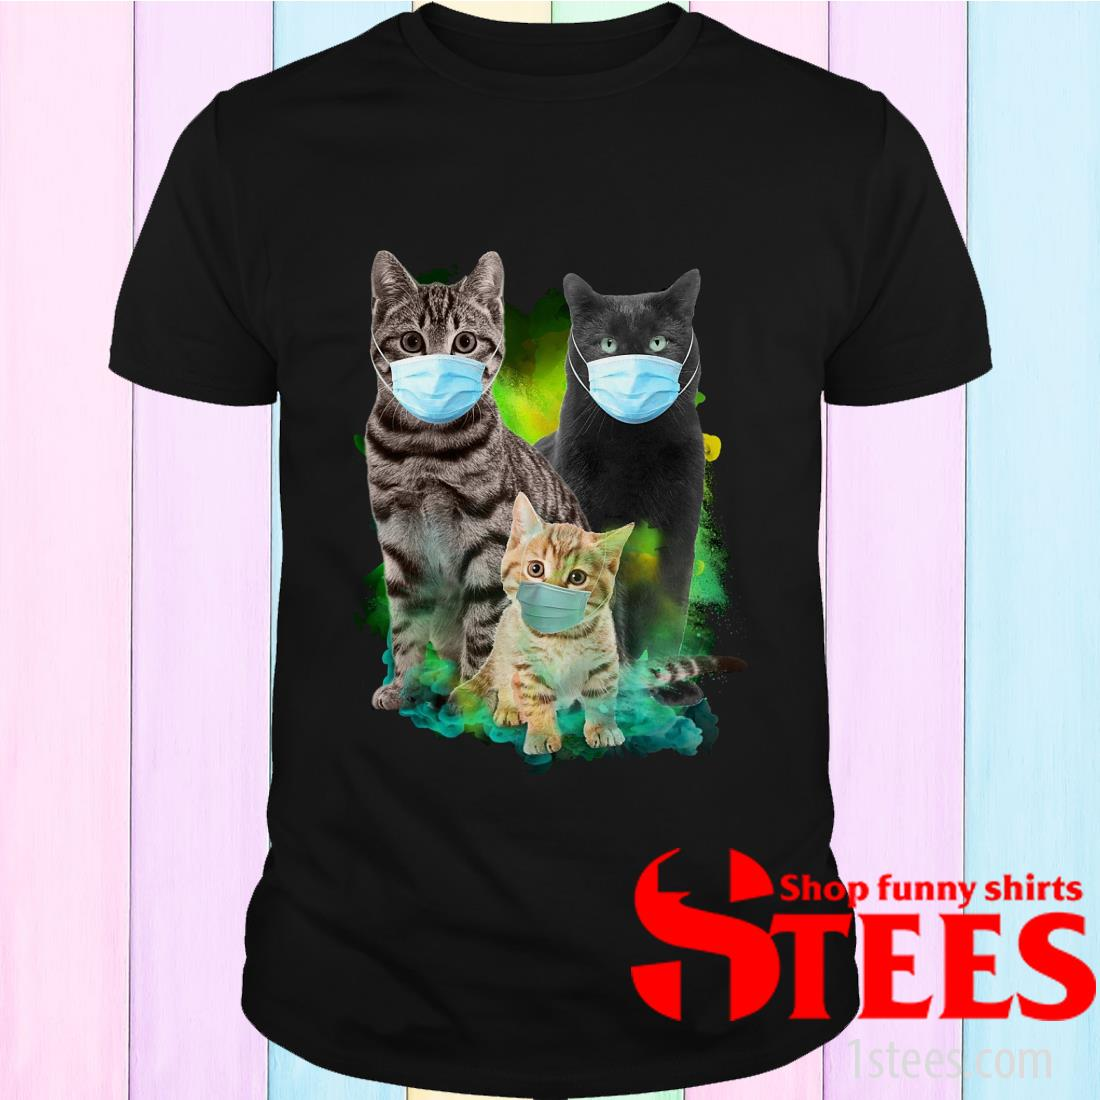 Cats Face Mask Coronavirus tee shirt